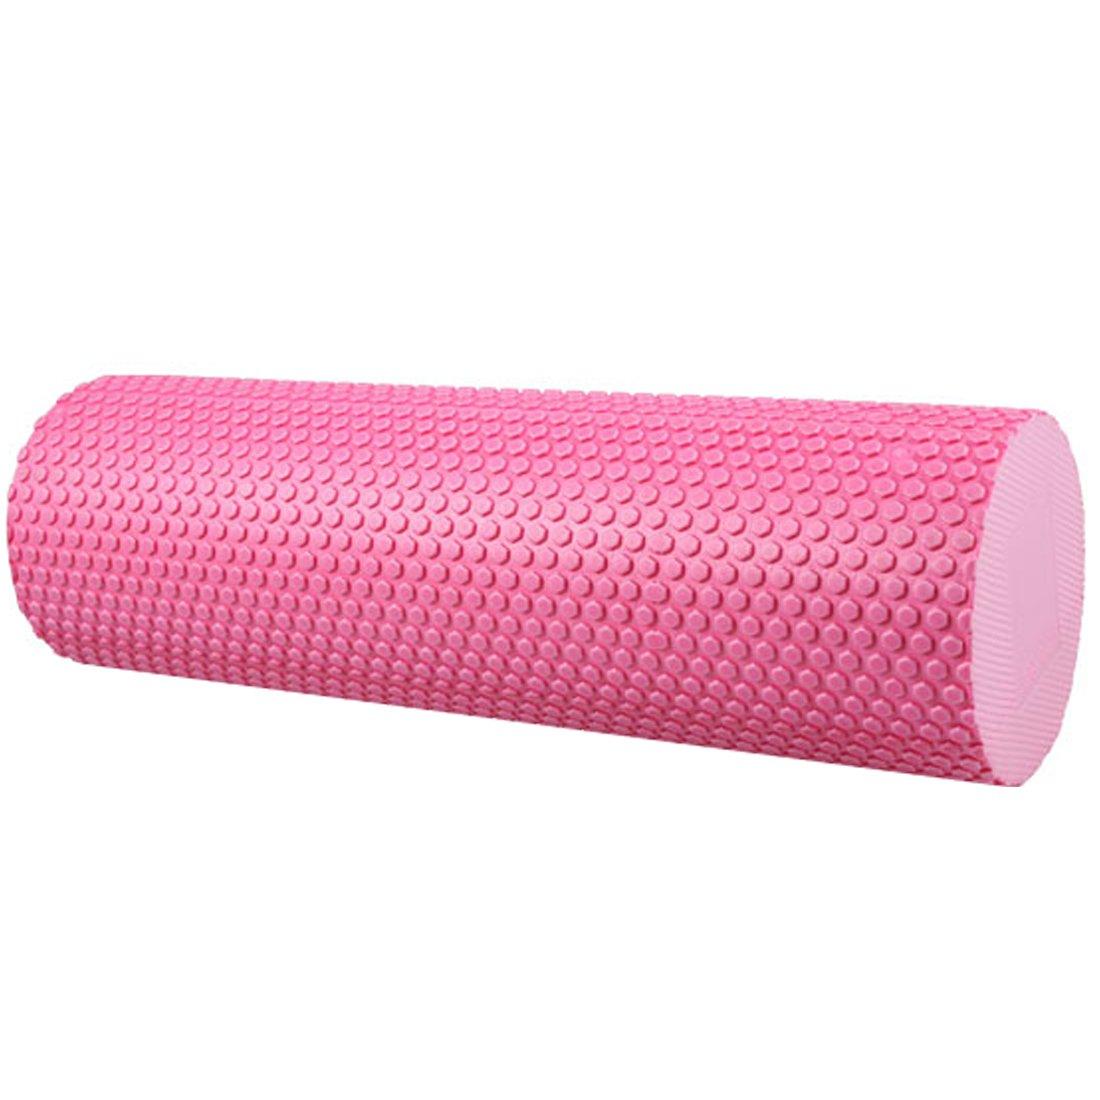 Partiss 30CM-60CM Muscle Mauler Foam Roller For Massage Yoga